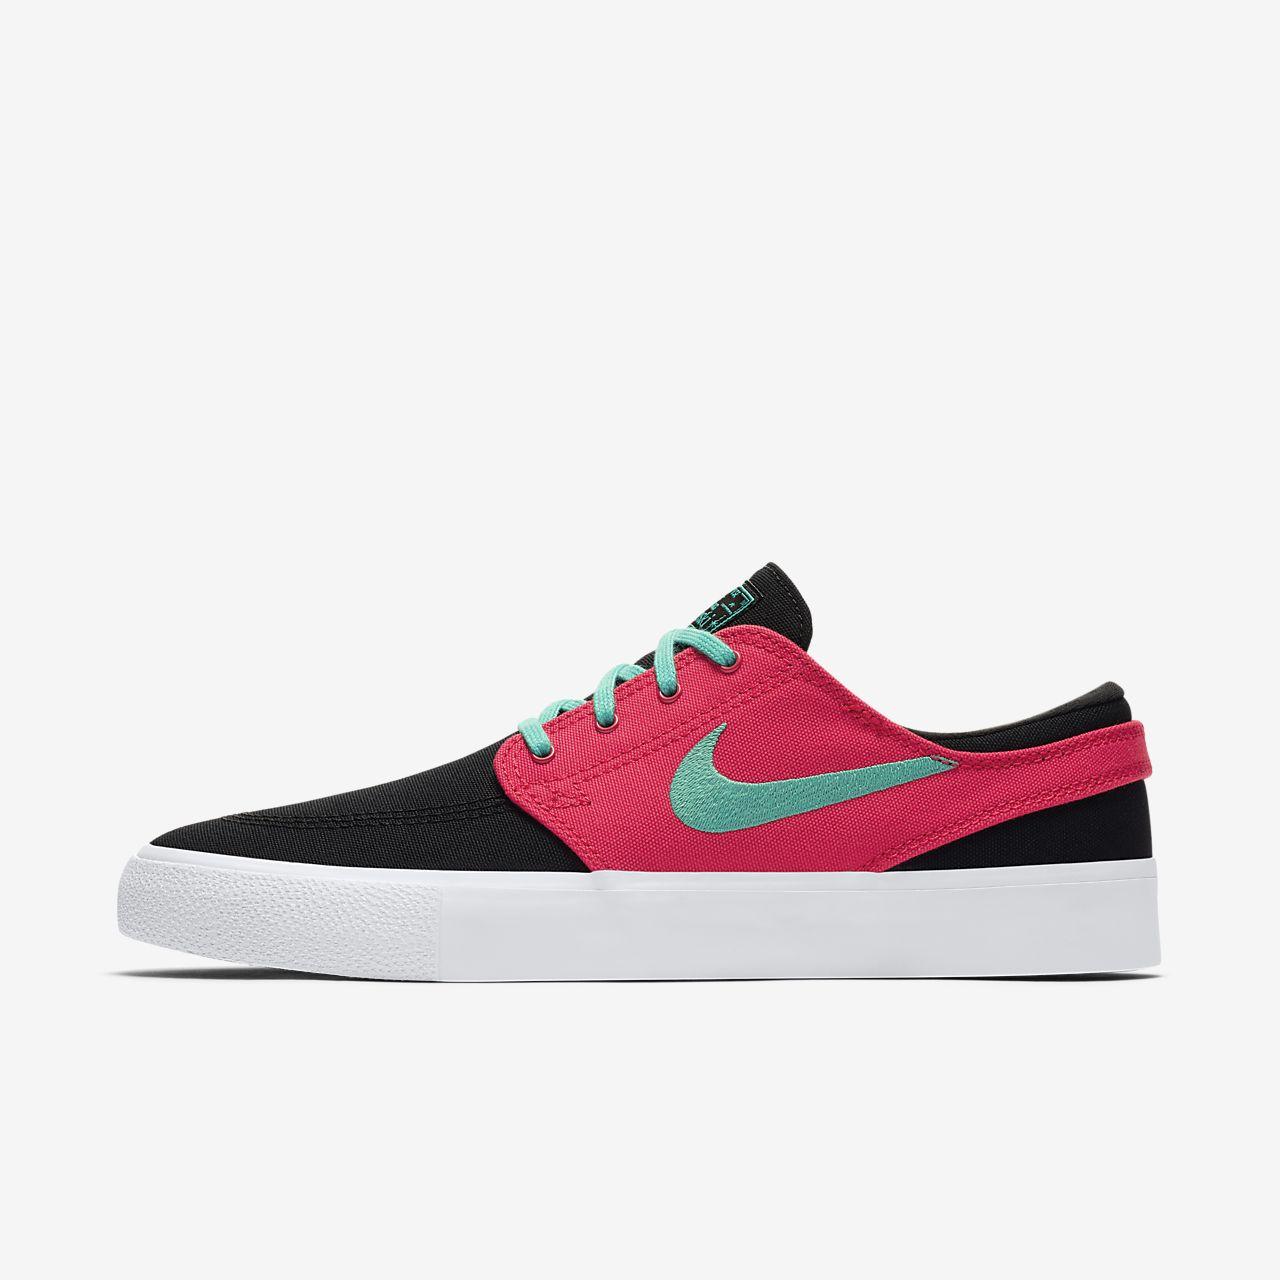 Skateboardsko Nike SB Zoom Stefan Janoski Canvas RM